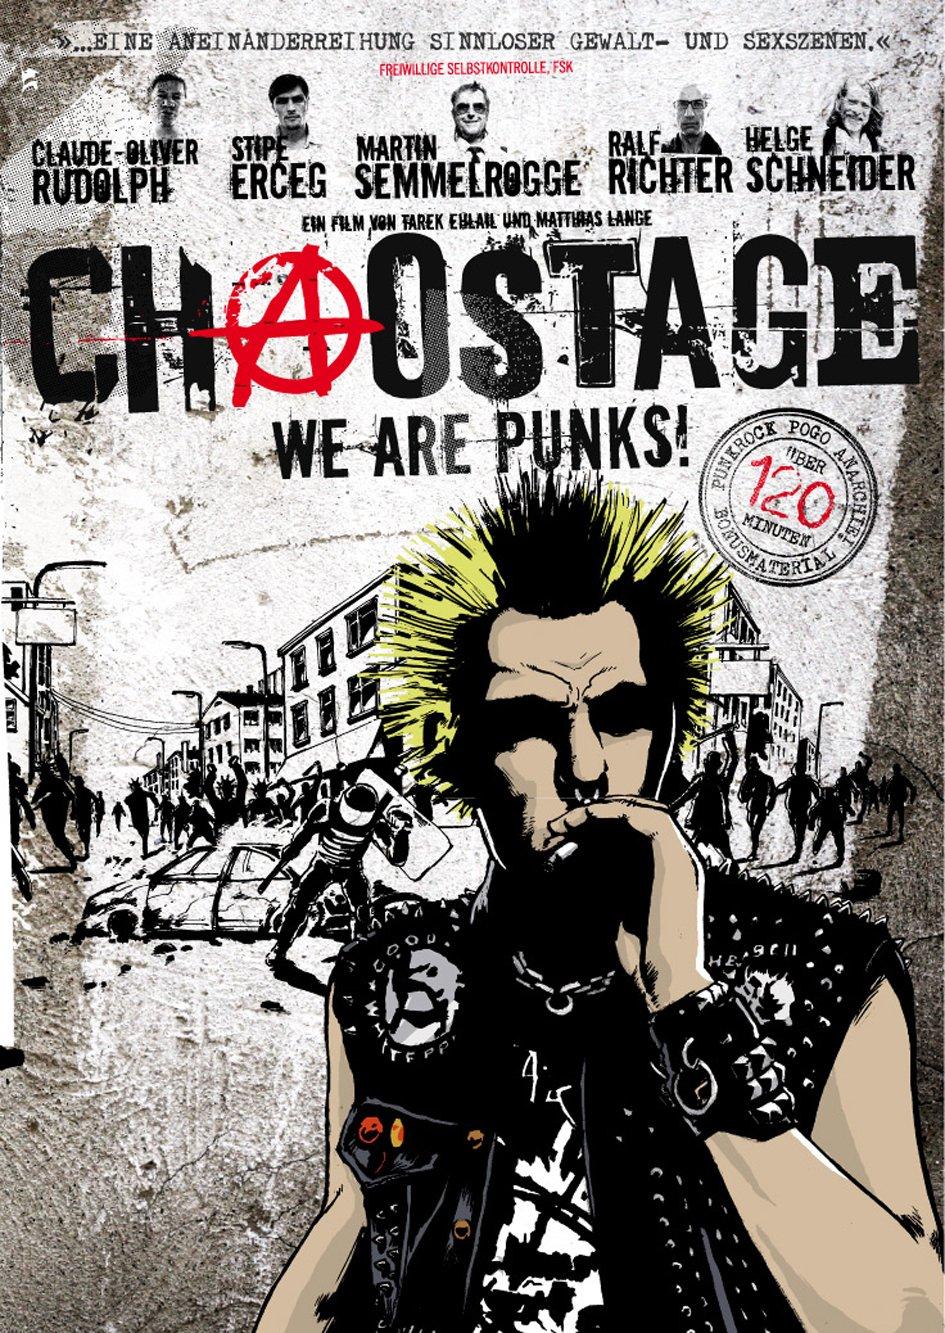 Cartel de la película 'Chaostage - We Are Punks' (2009)